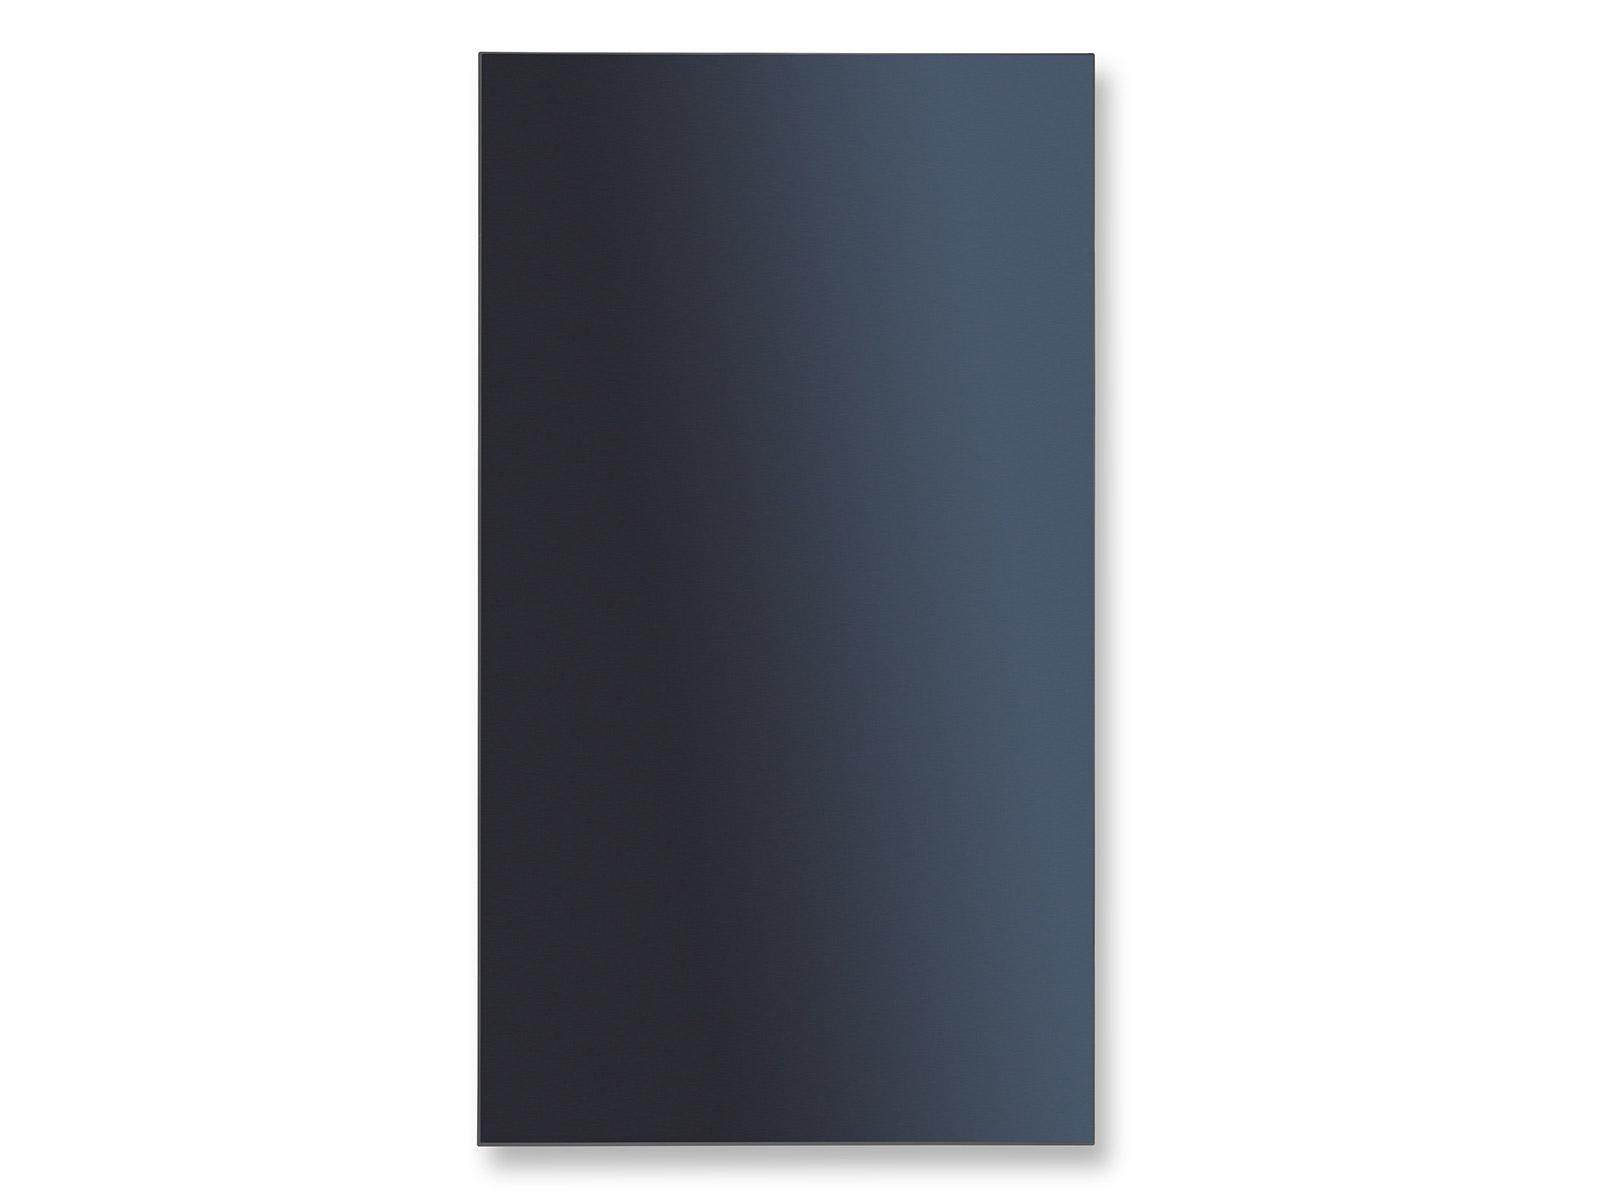 NEC-Display-Solutions_X464UNV-2-DisplayViewFrontalBlack-Port